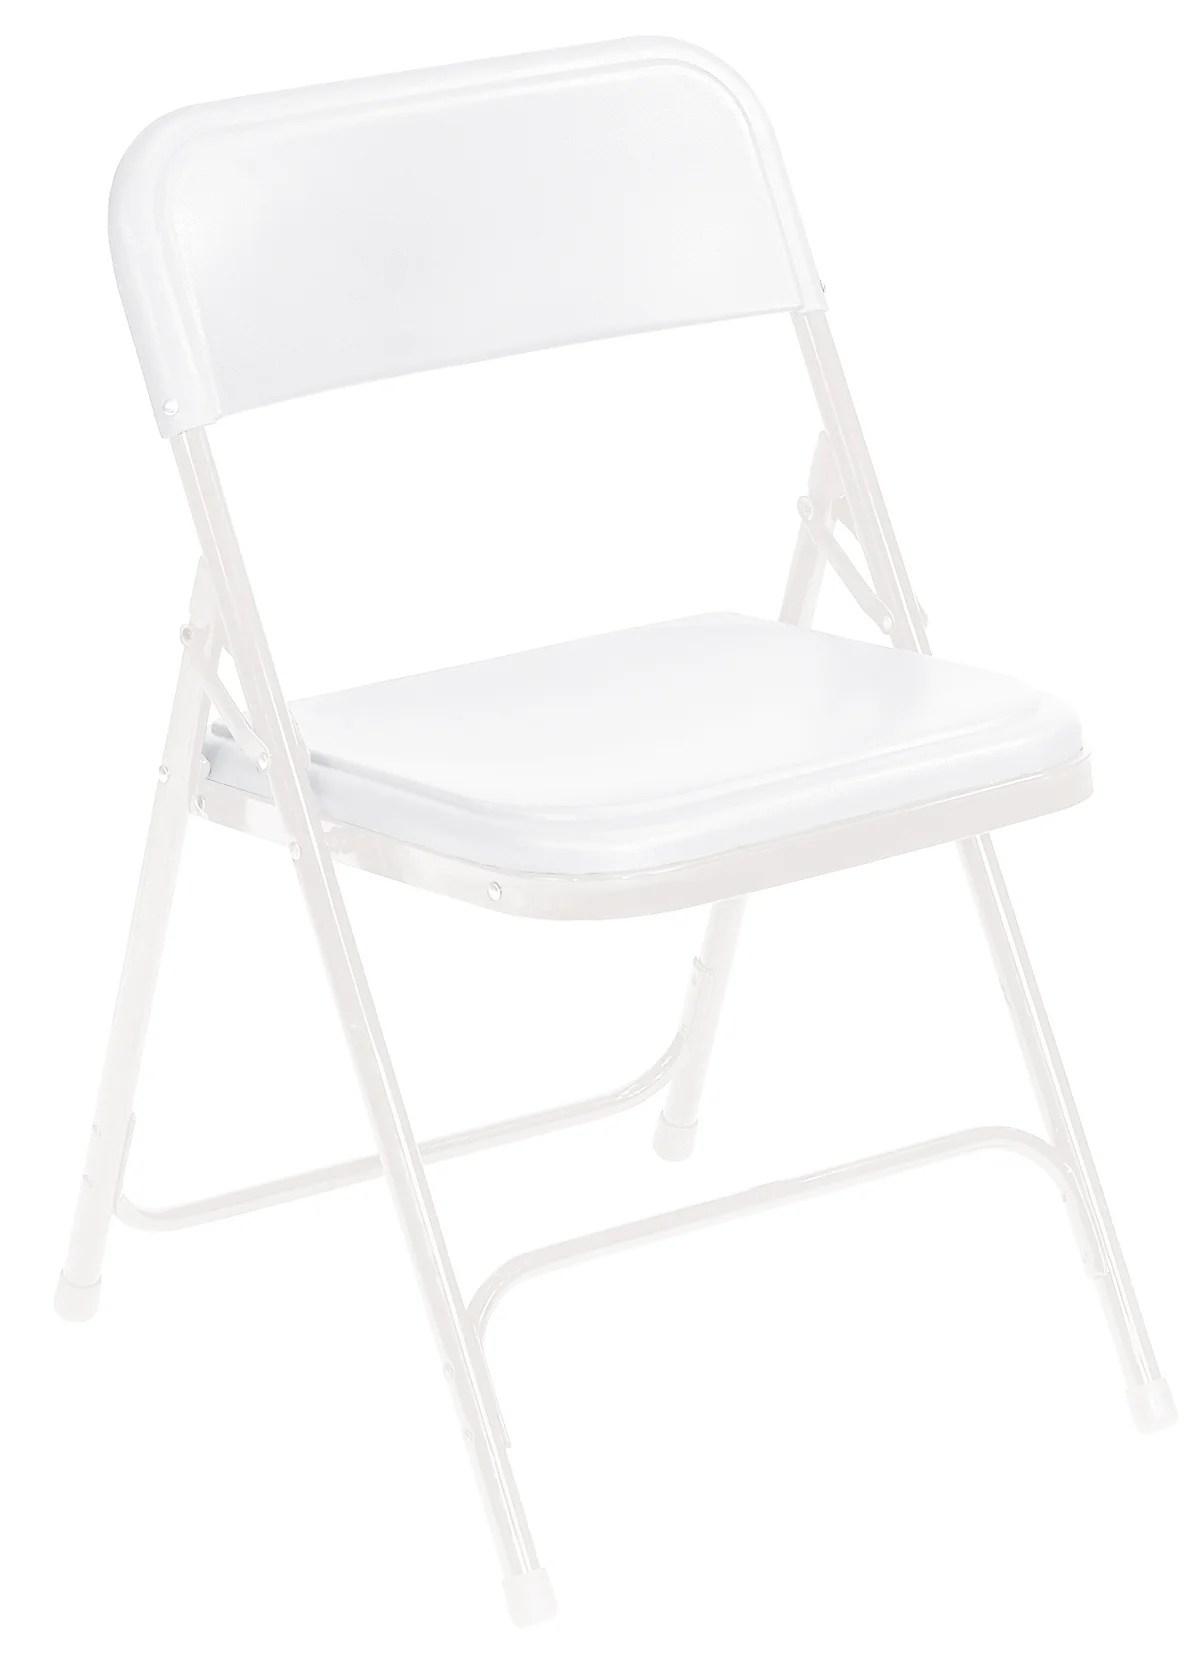 National Public Seating 800 Series Lightweight Folding